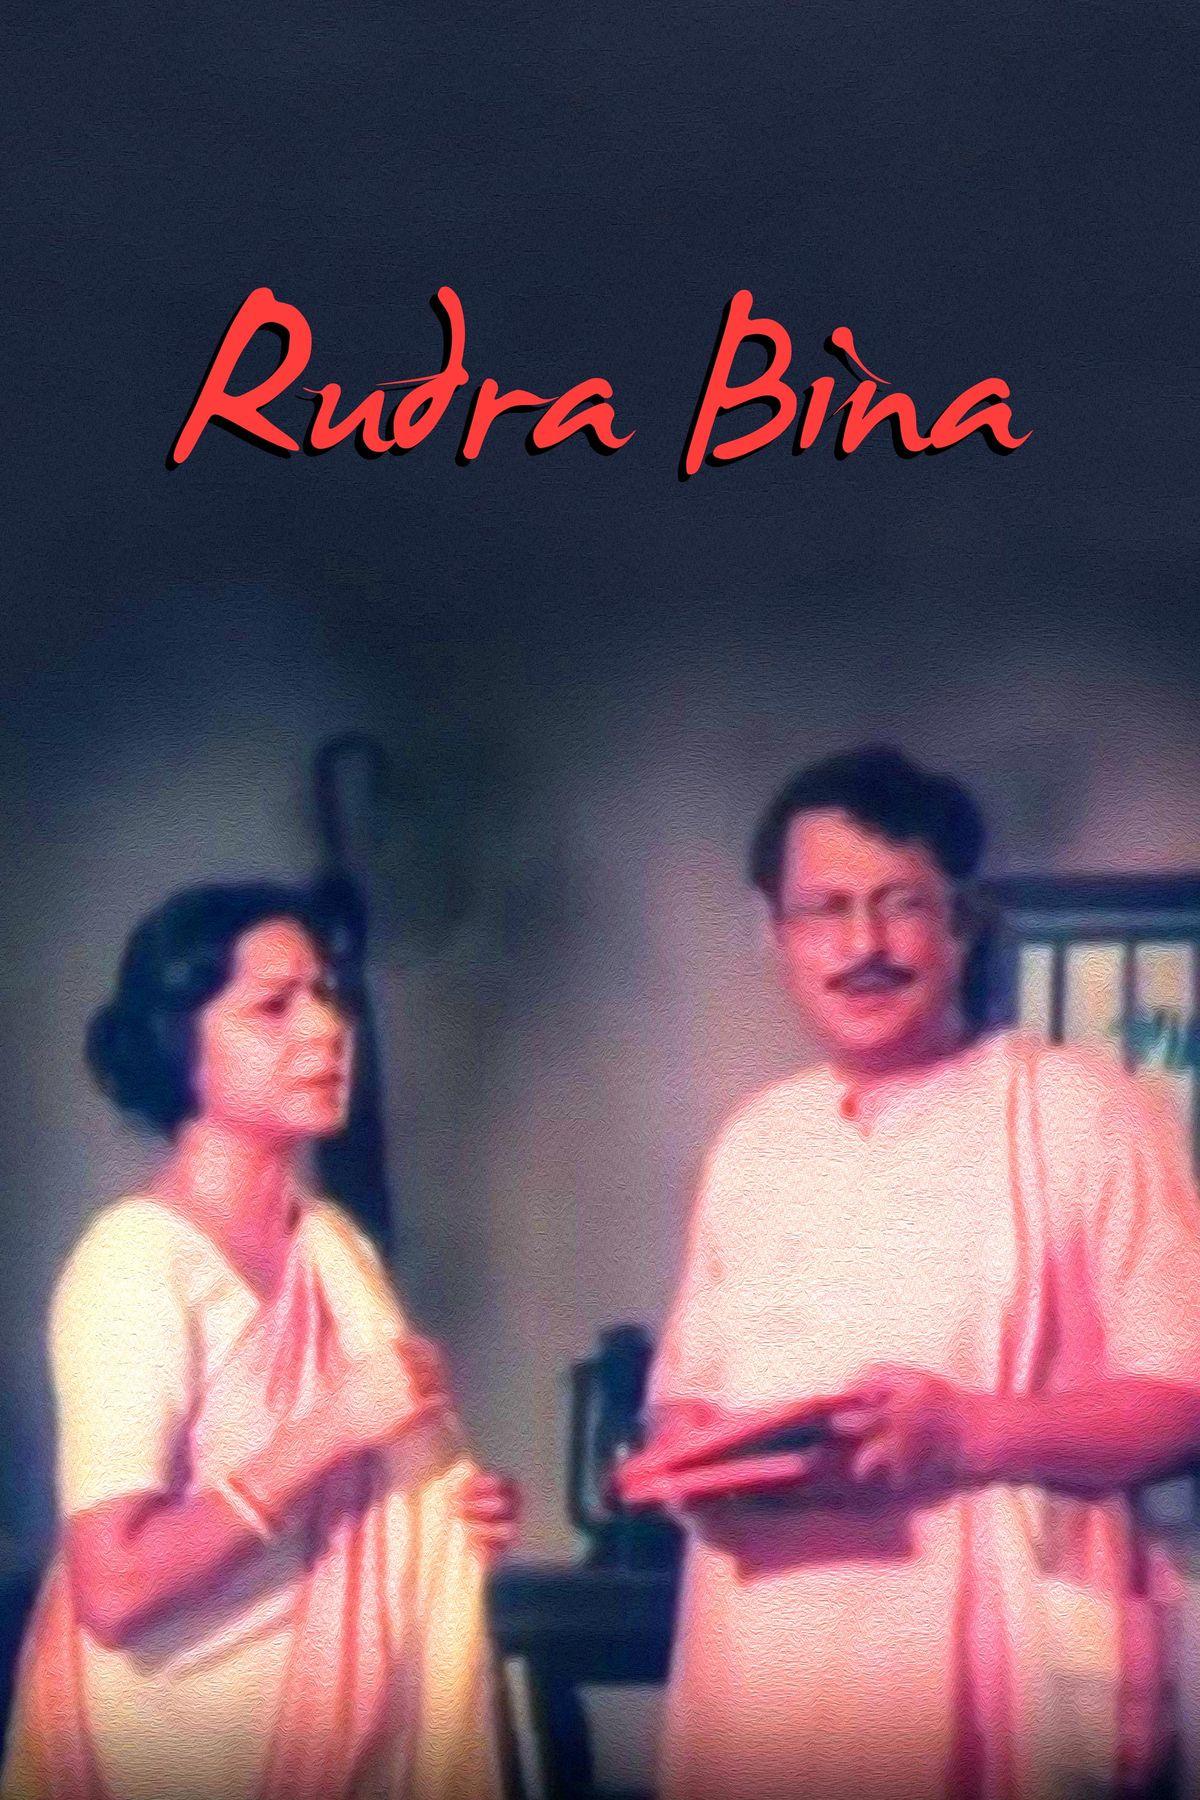 Rudra Bina